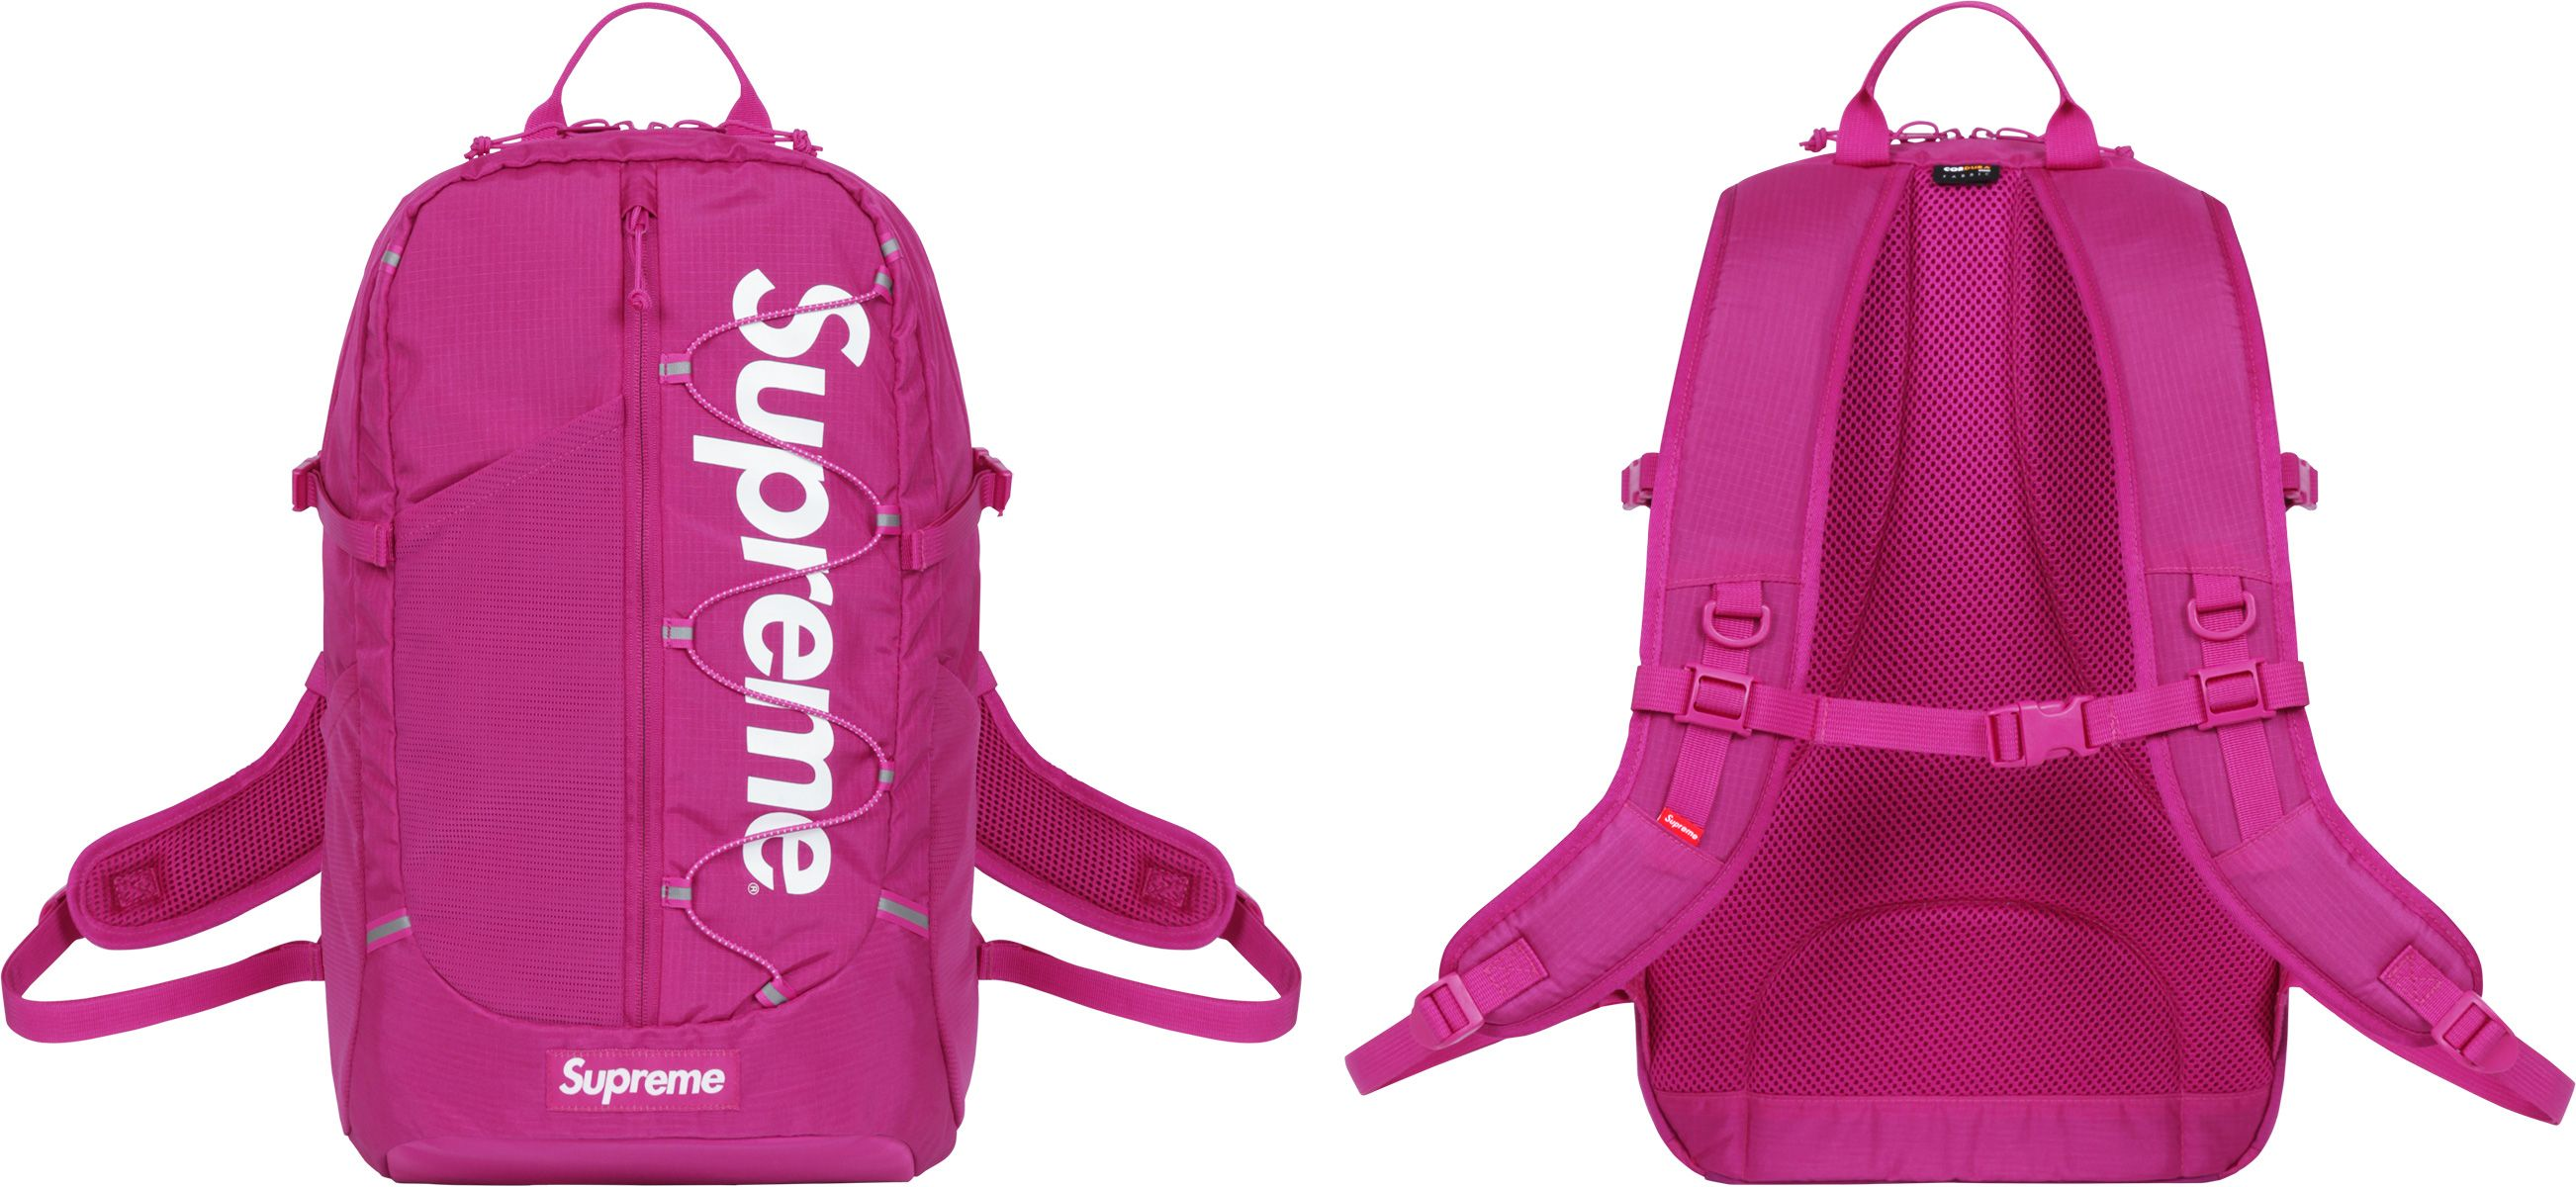 f4c33fd1e9c Supreme Backpack | Supreme Bag Wear in 2019 | Supreme backpack, Golf ...